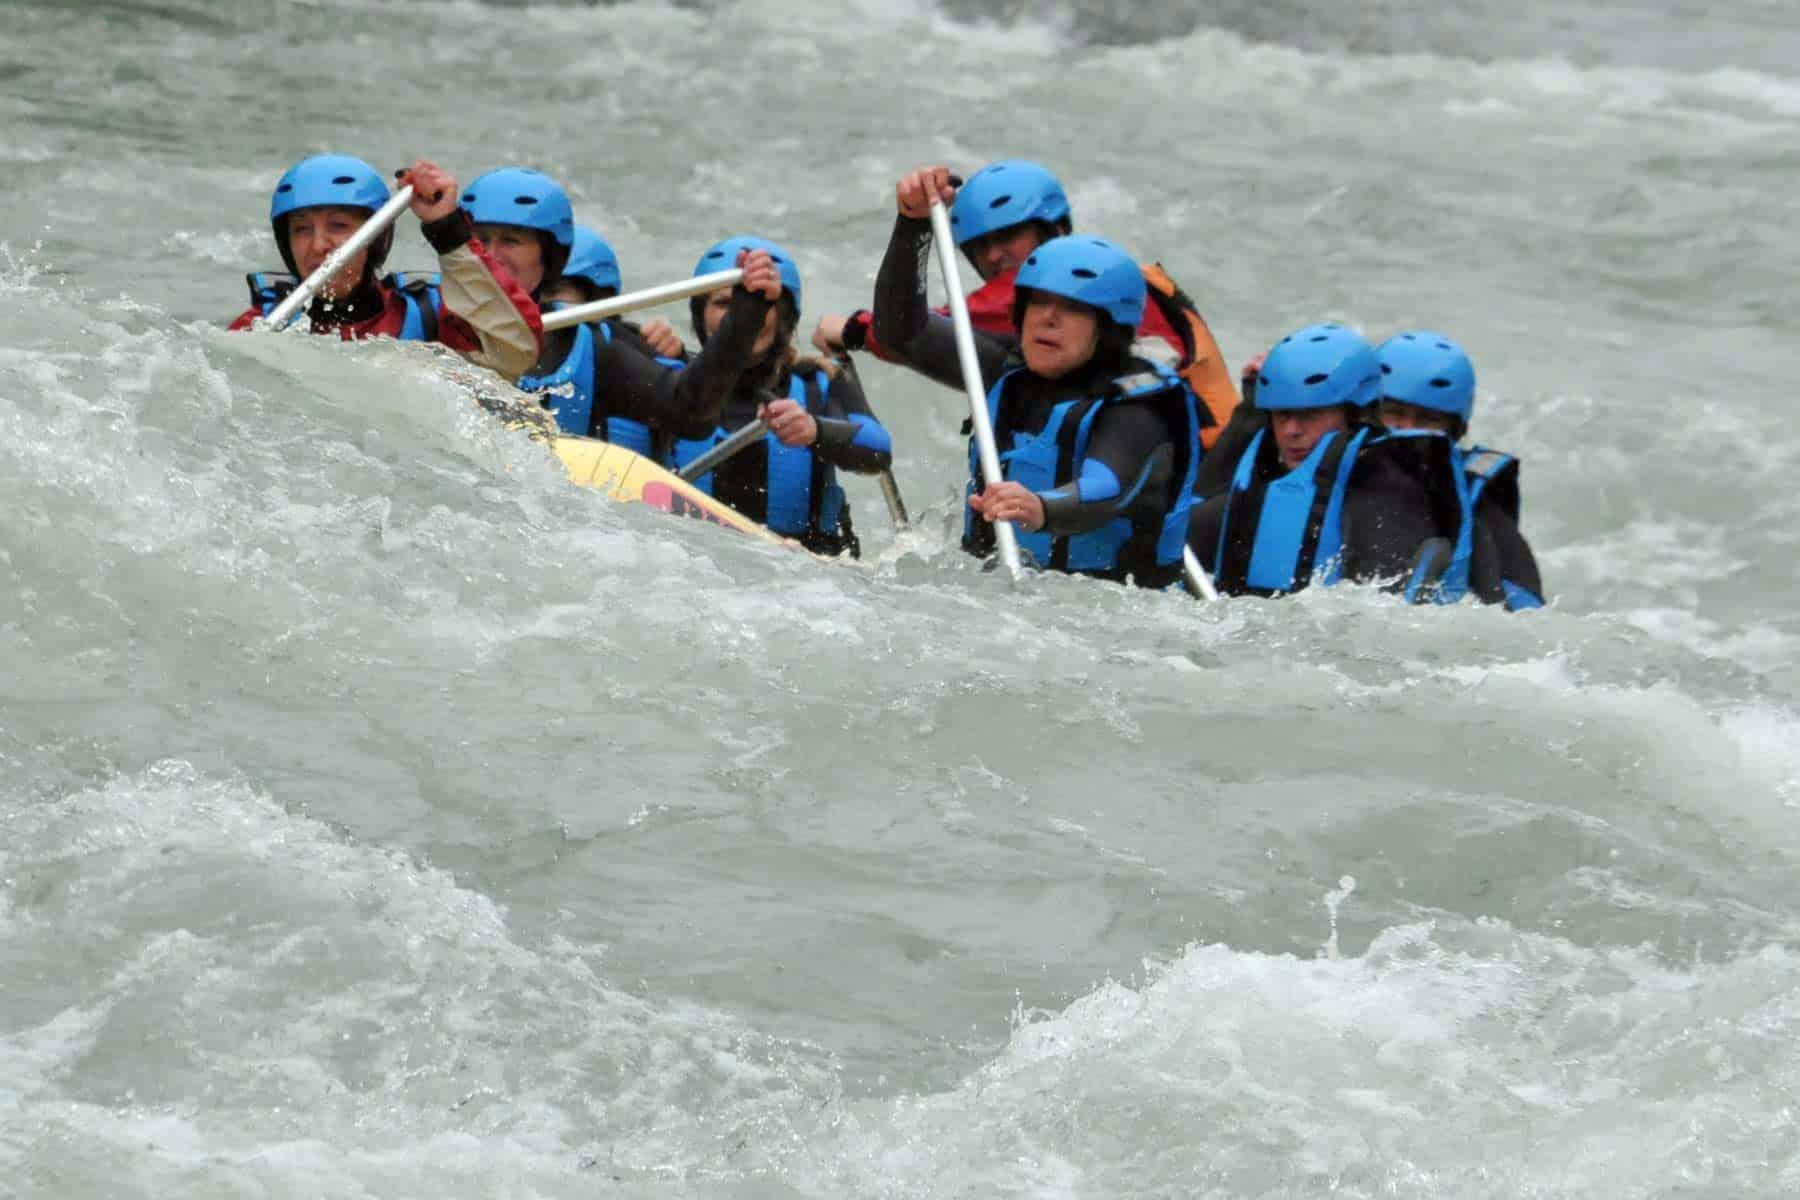 Whitewater rafting at Brstanovica